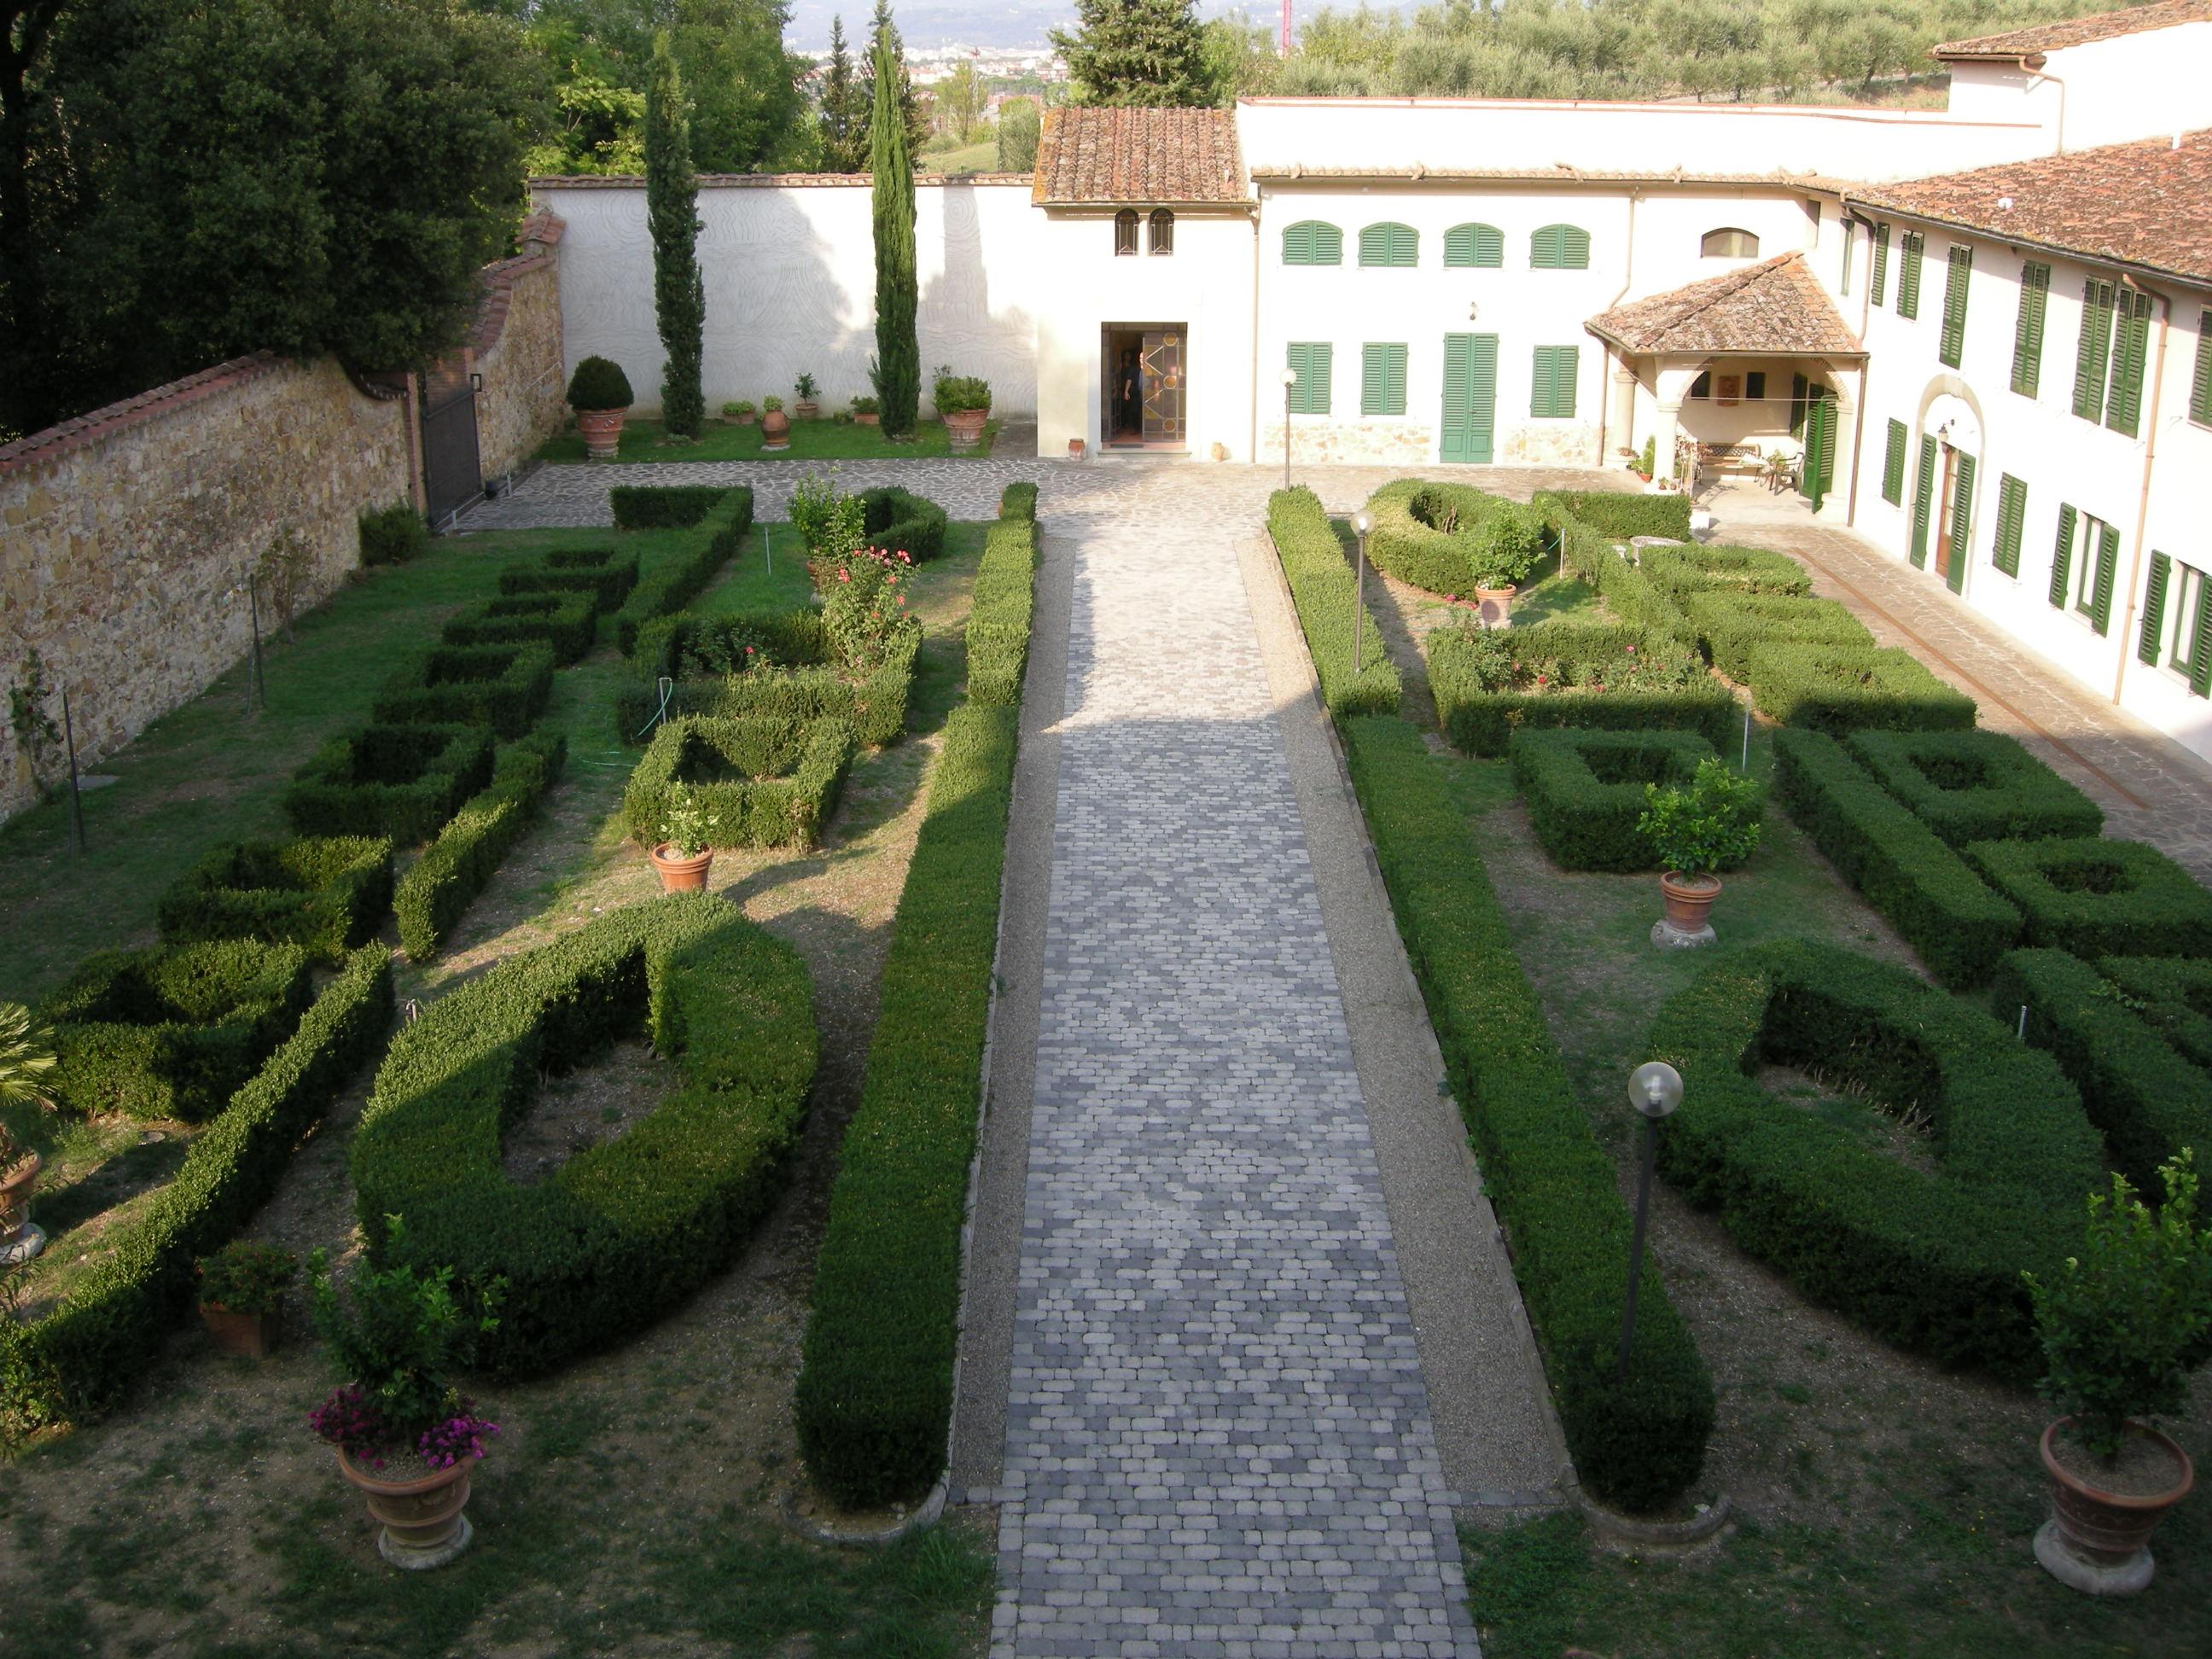 File villa la nerlaia giardino all 39 italiana - Giardino all italiana ...